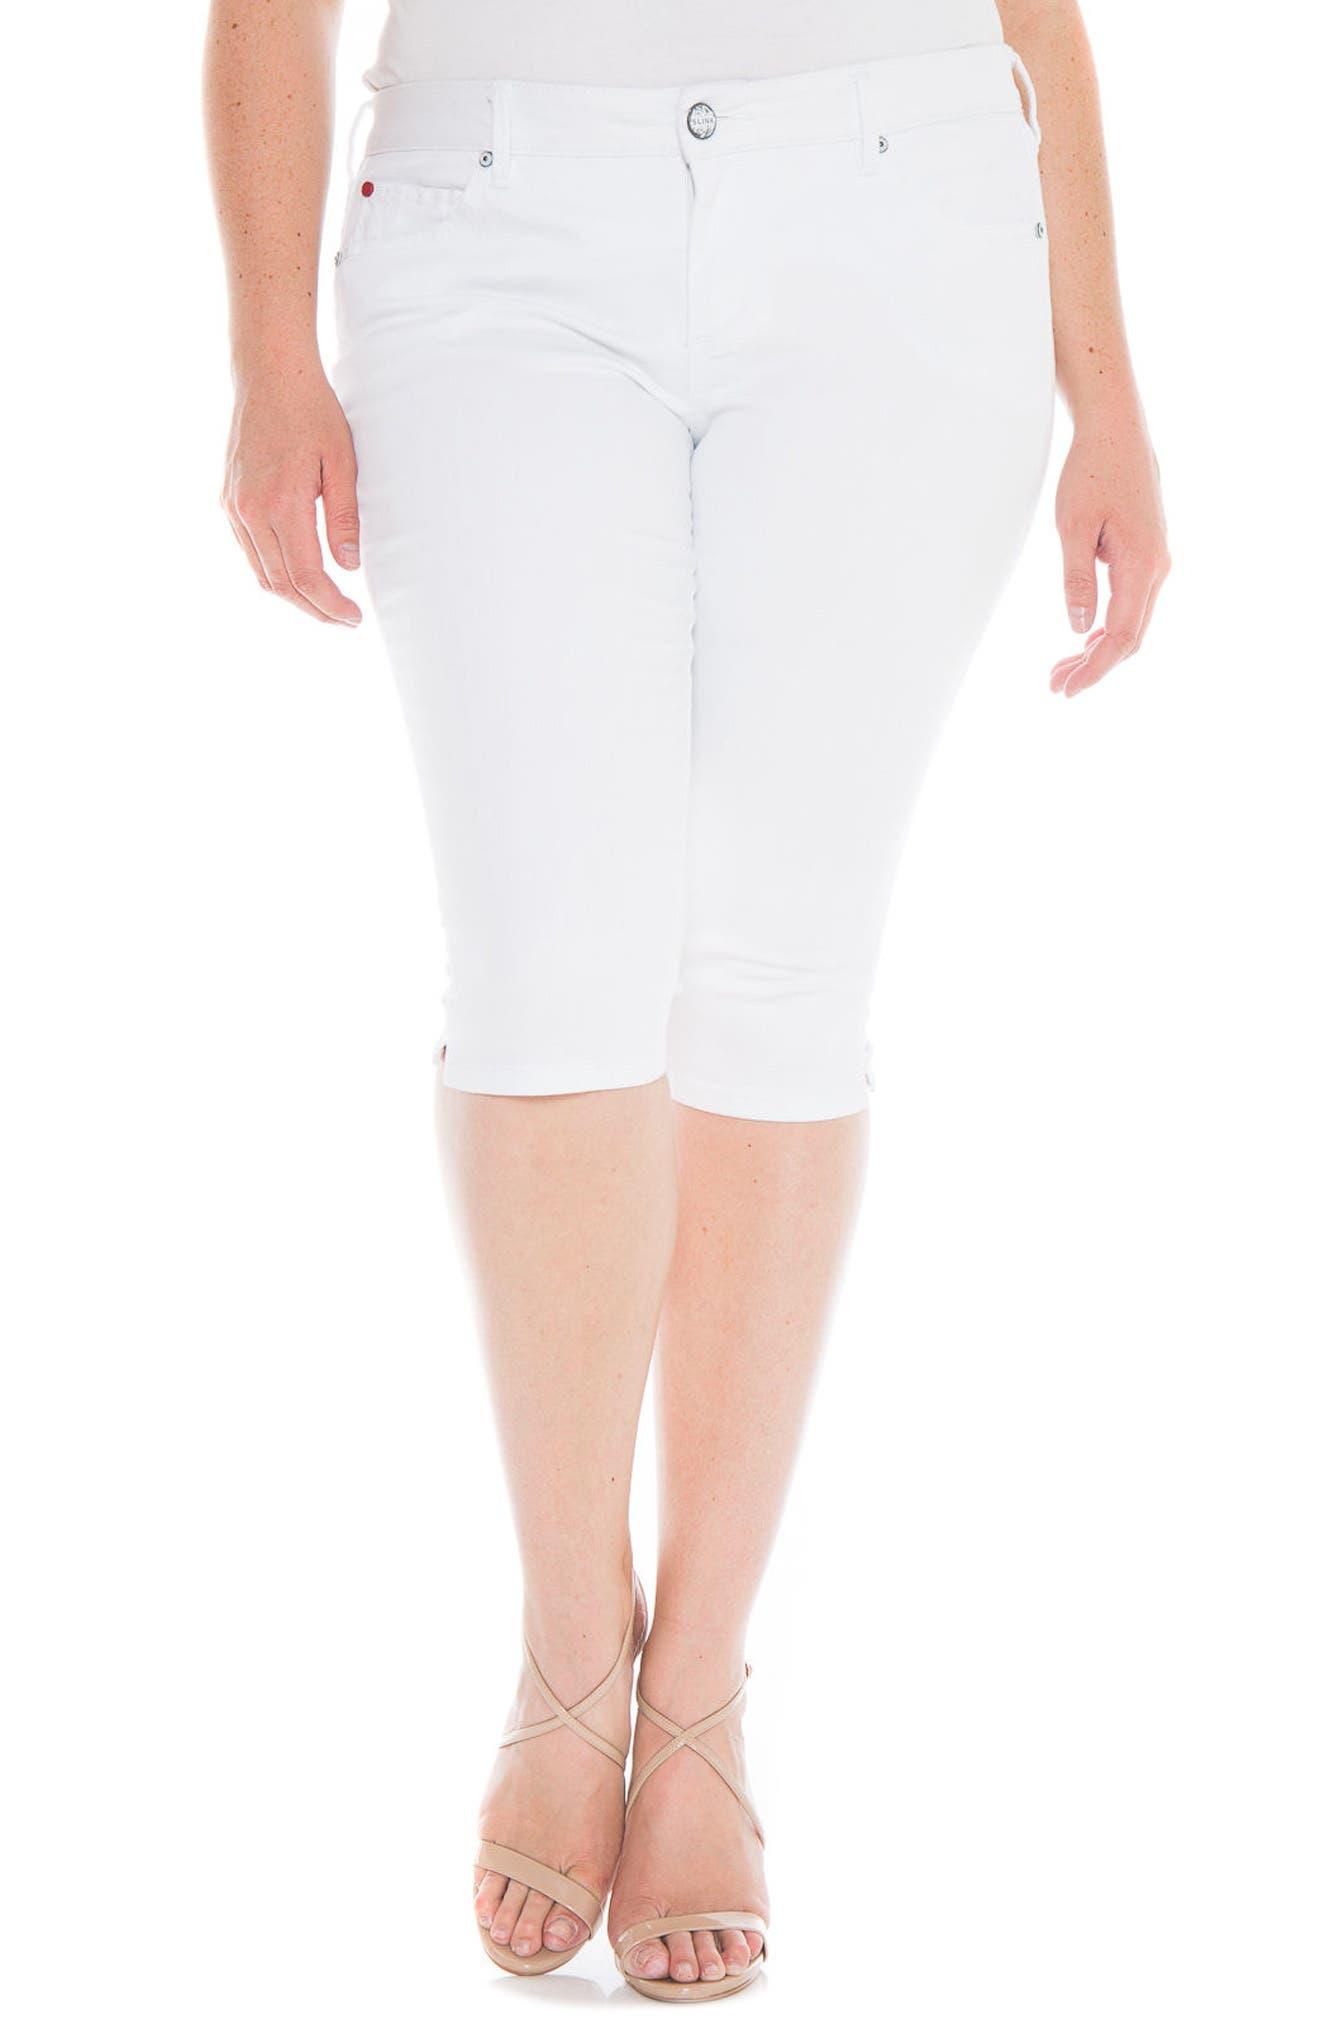 SLINK Jeans Pirate Skinny Capri Jeans (Plus Size)